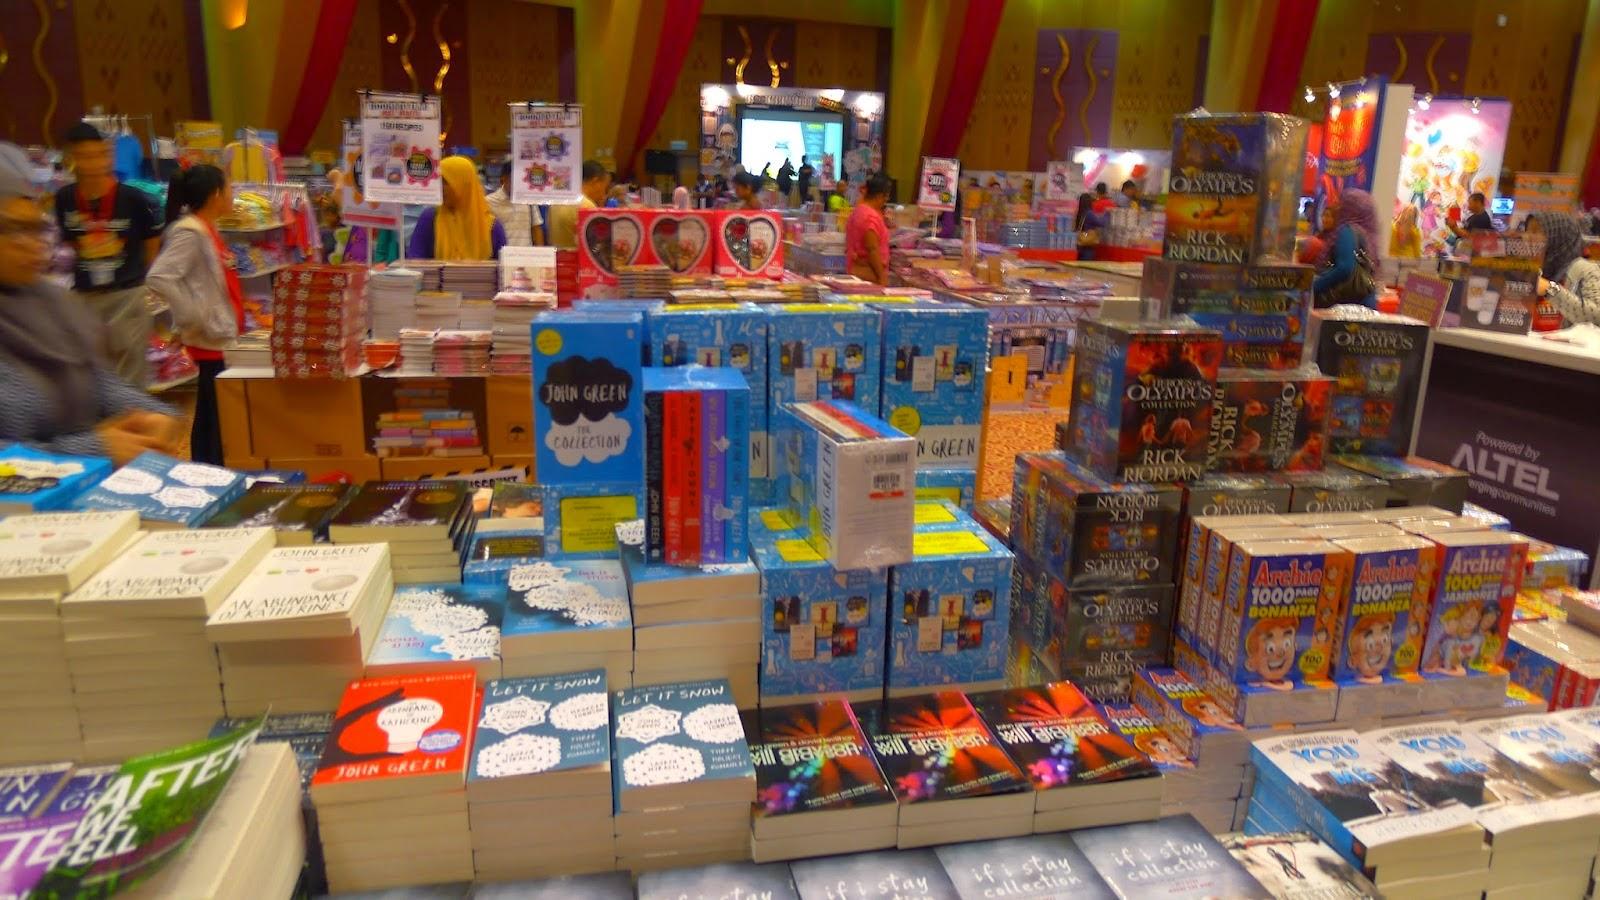 Jom Kuala Lumpur International Book Fair 2015 KLiBF 2015 Duniaku